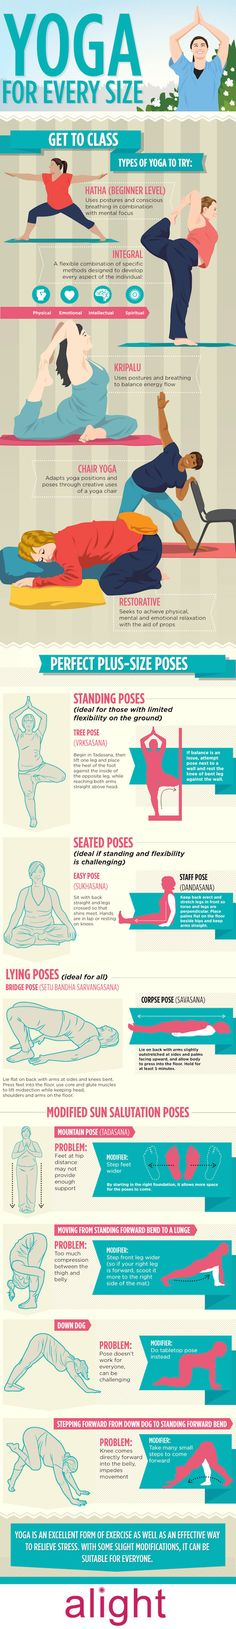 Infographic: 14 Yoga Poses For Every Body Shape And Size - DesignTAXI.com